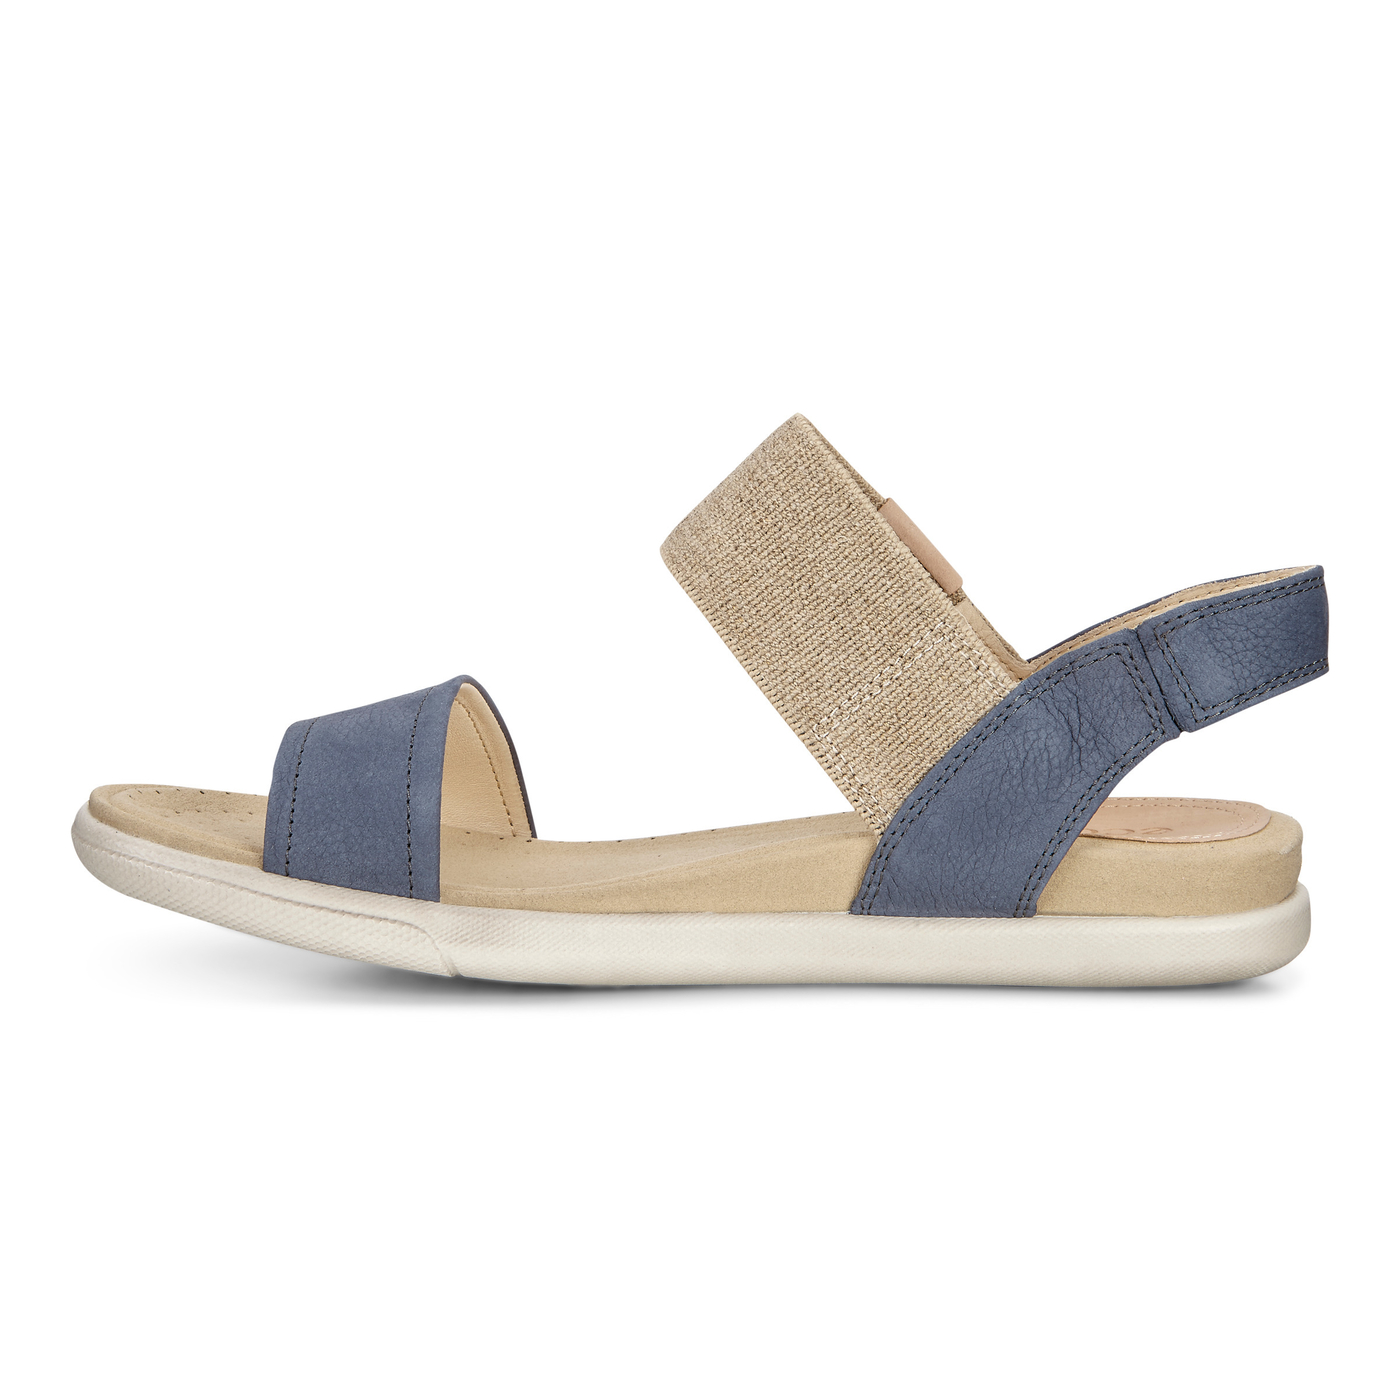 bb5ccf1b961 ECCO Damara Ankle Sandal